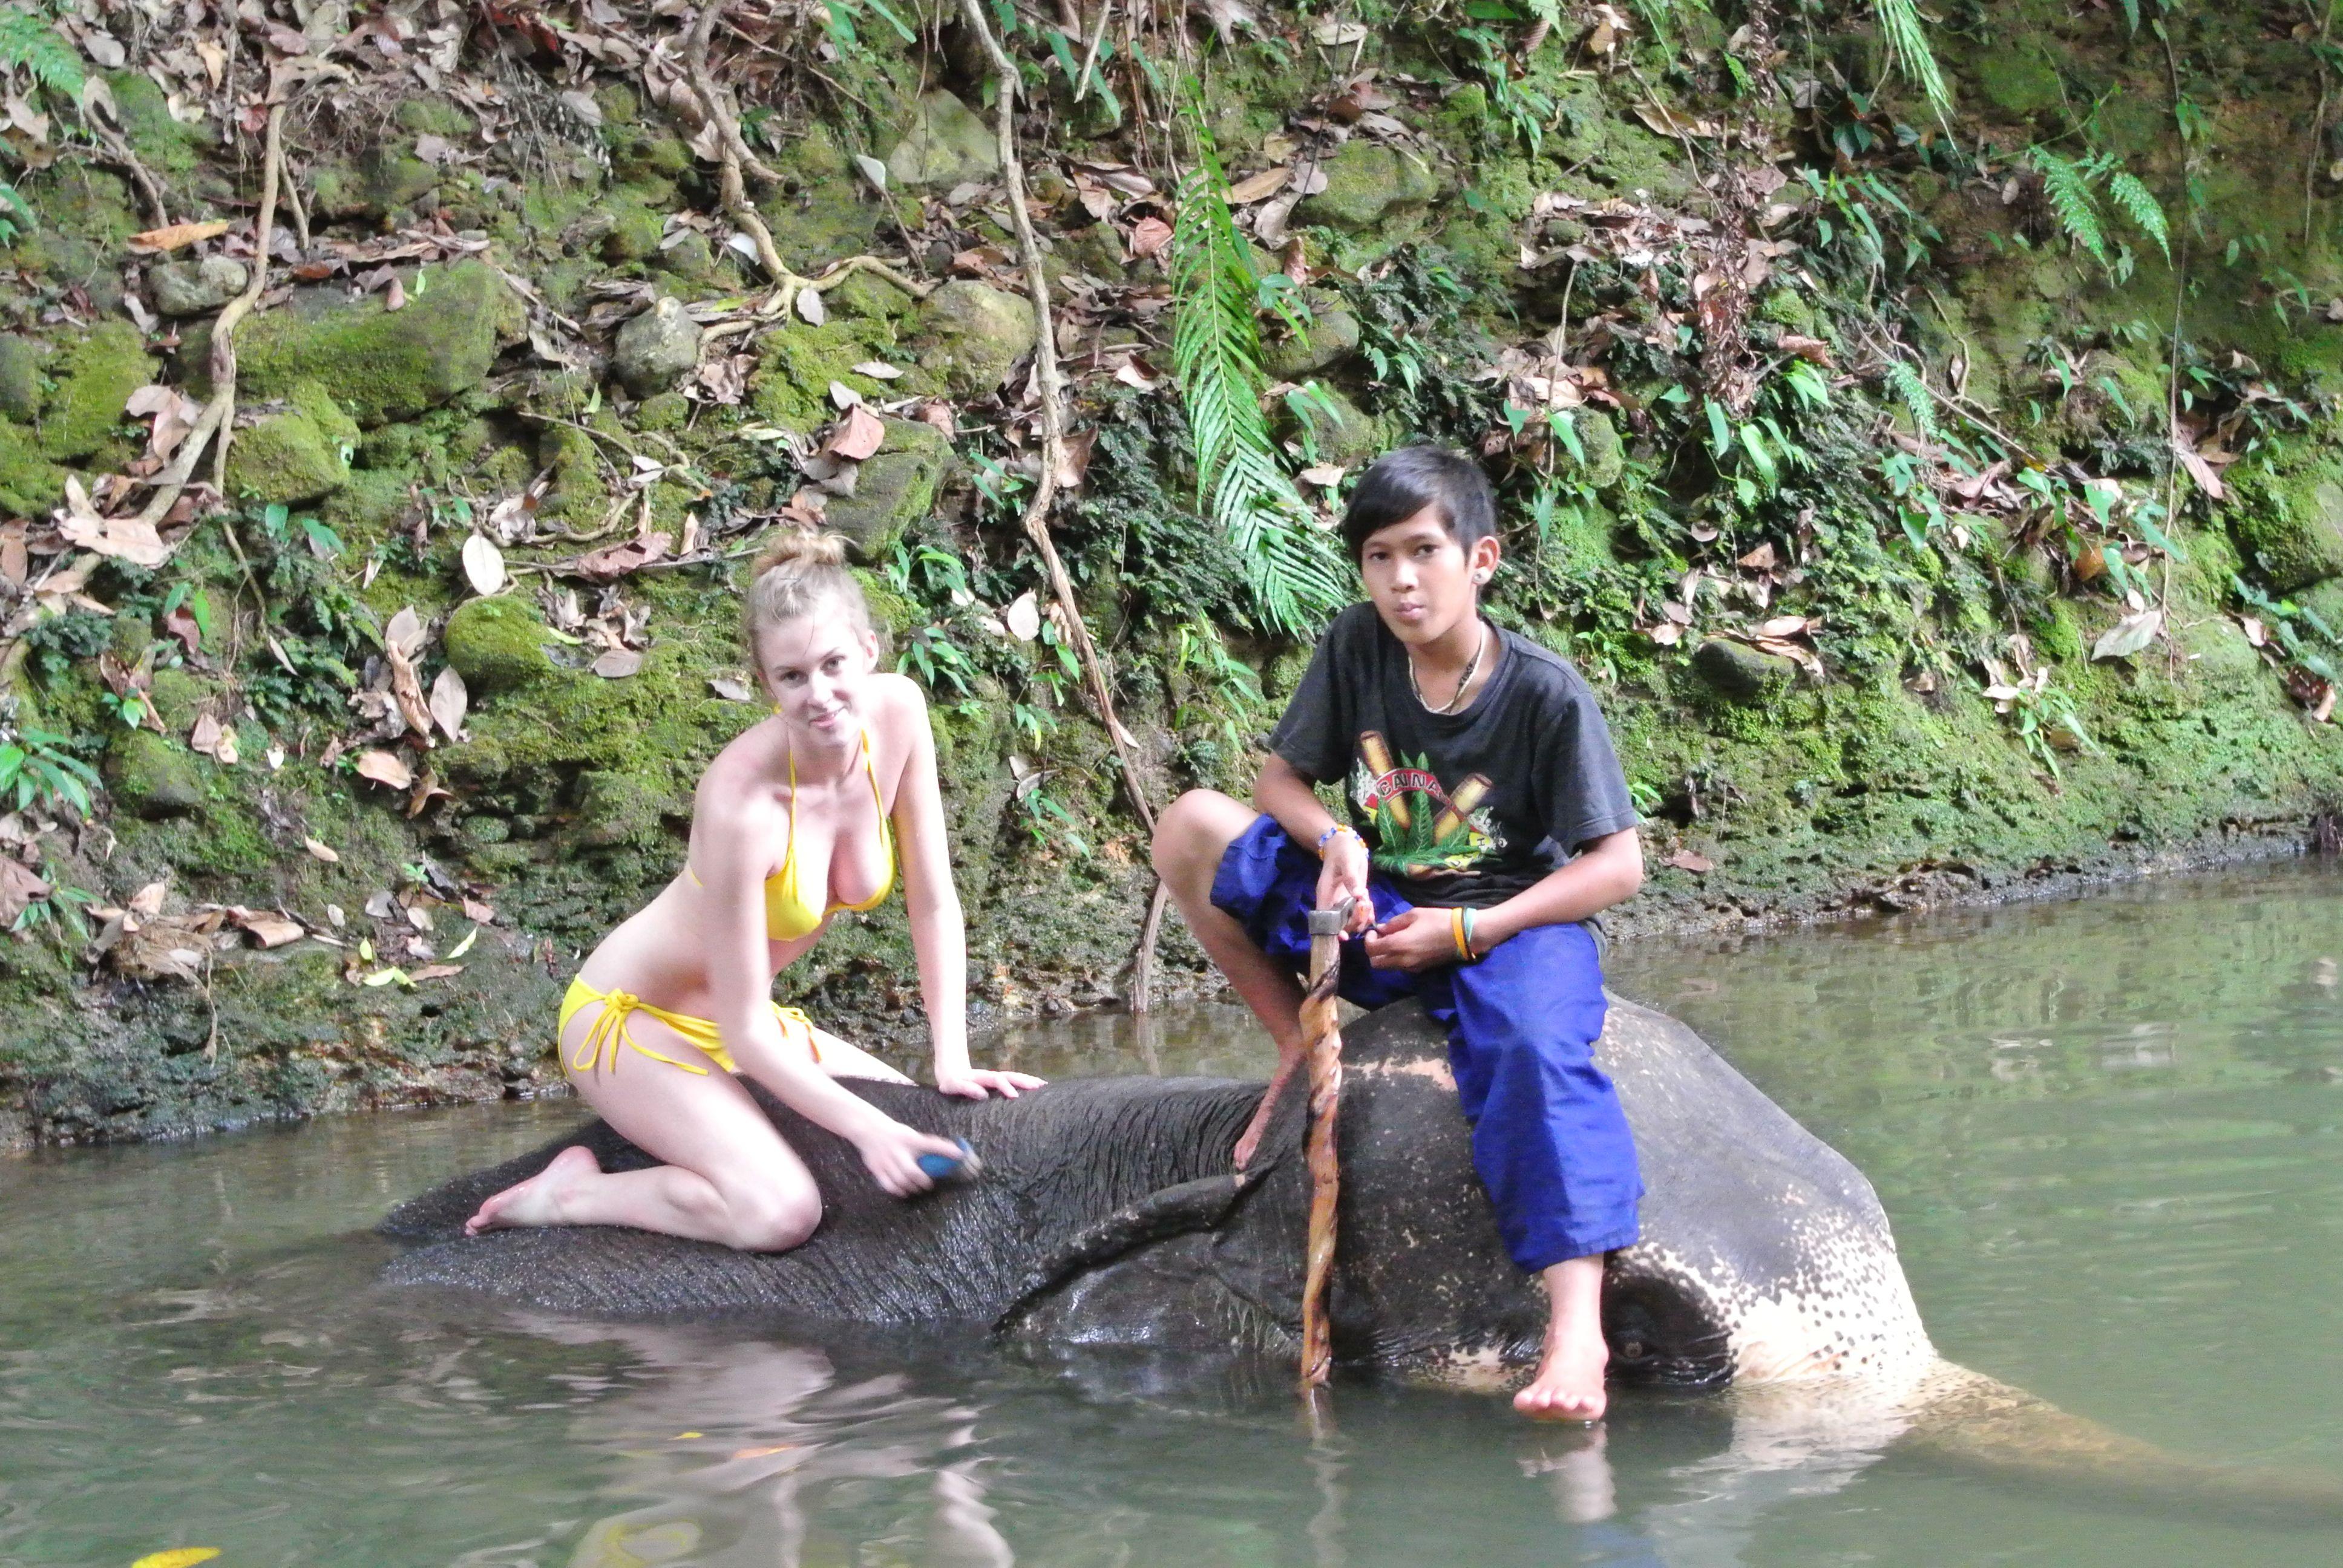 Sexy Woman in bikini washing an Elephant in the Jungle/Sexy Frau im bikini wäscht einen Elefant im Dschungel .